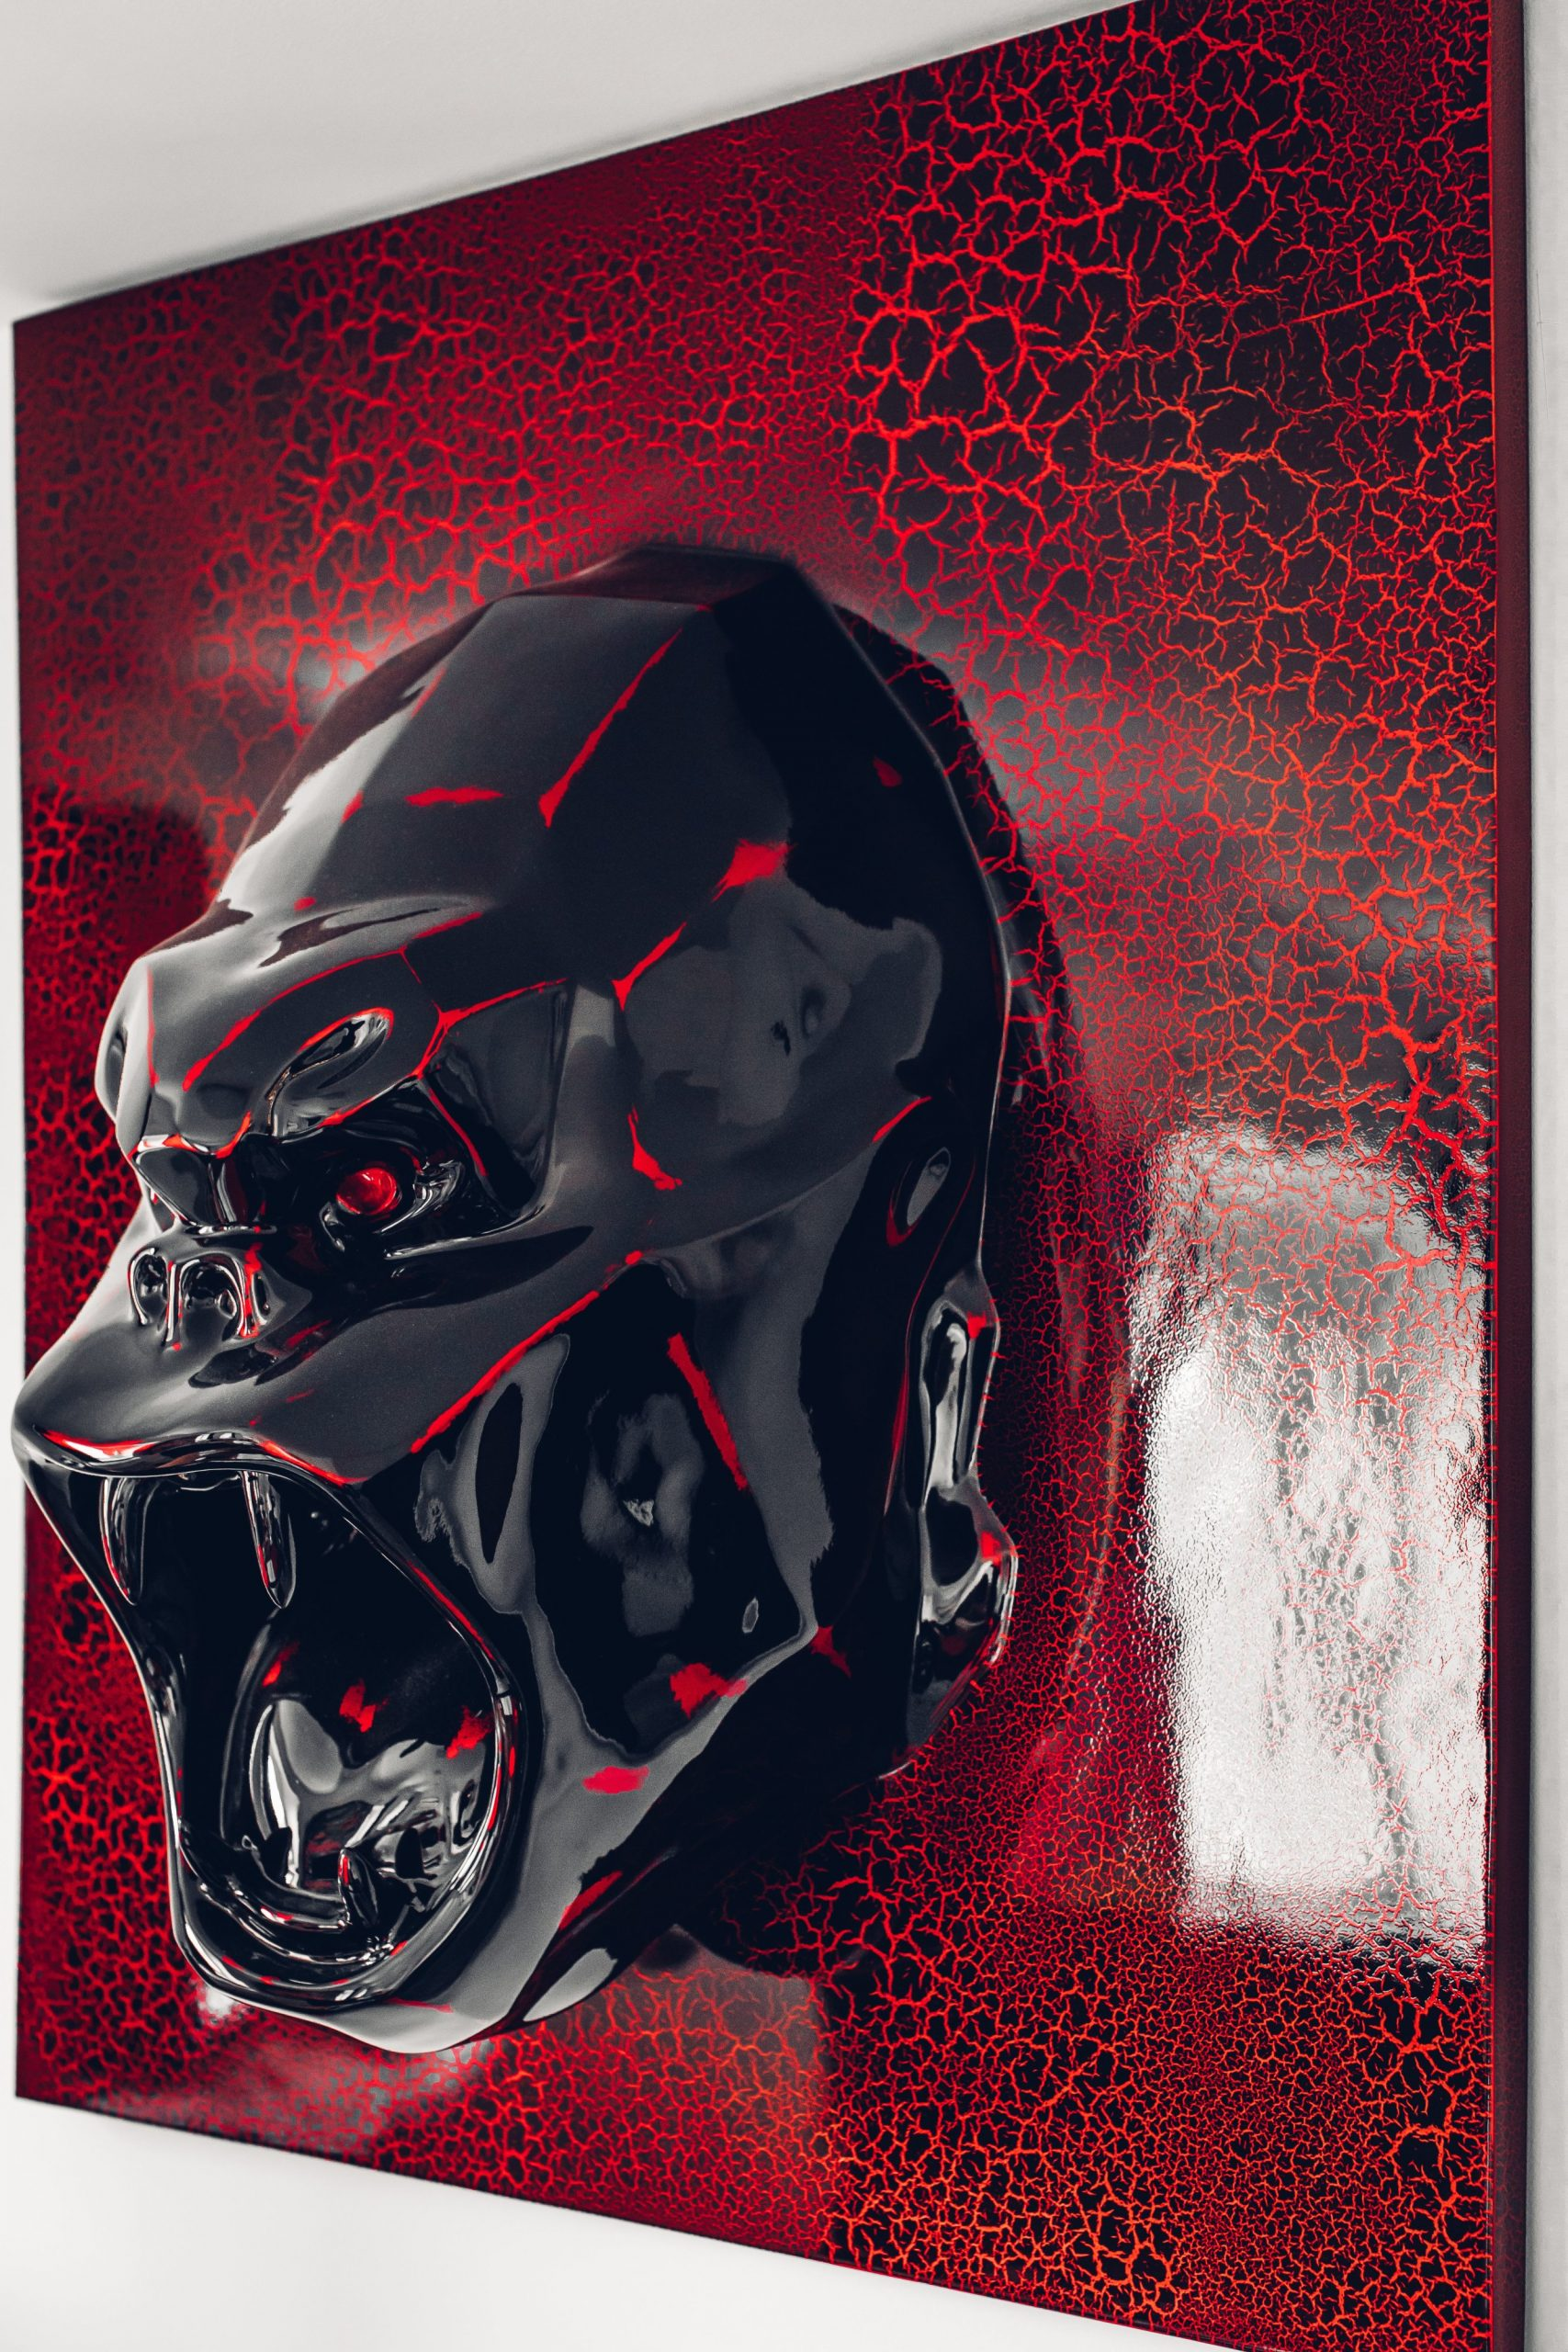 Wild Kong (Wall Mount, Red) by Richard Orlinski